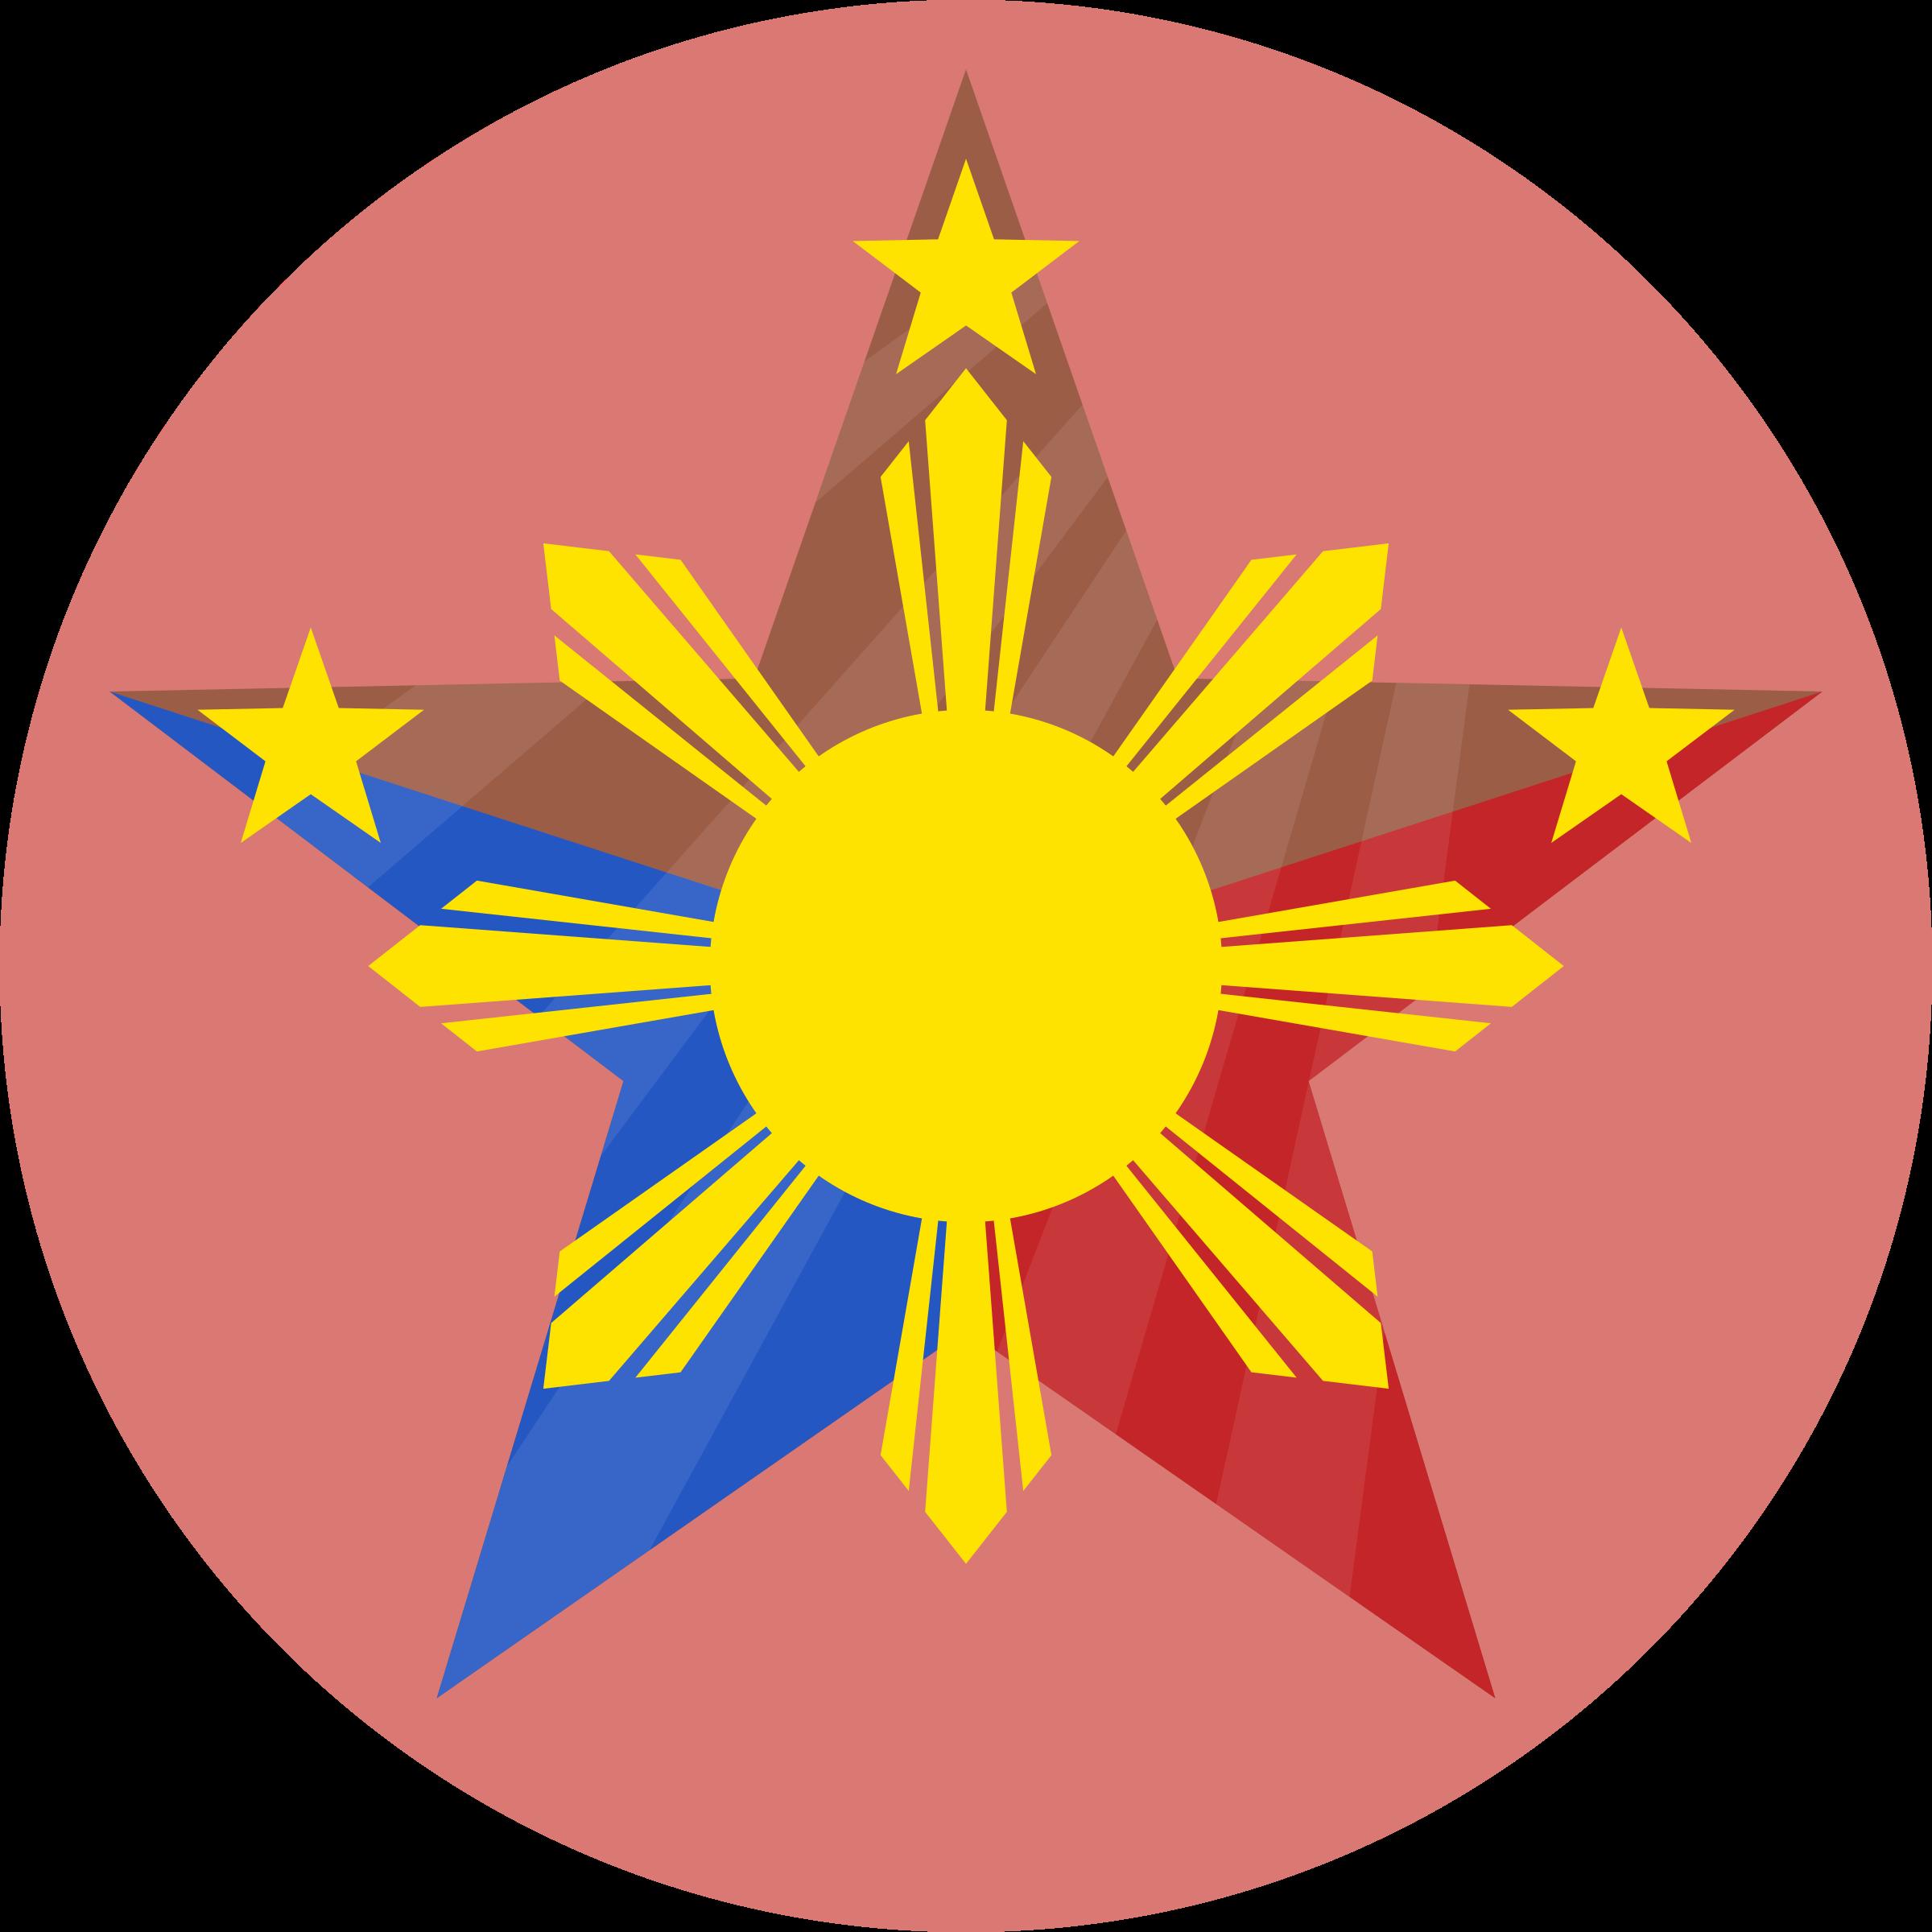 Respect clipart symbol filipino.  collection of philippine